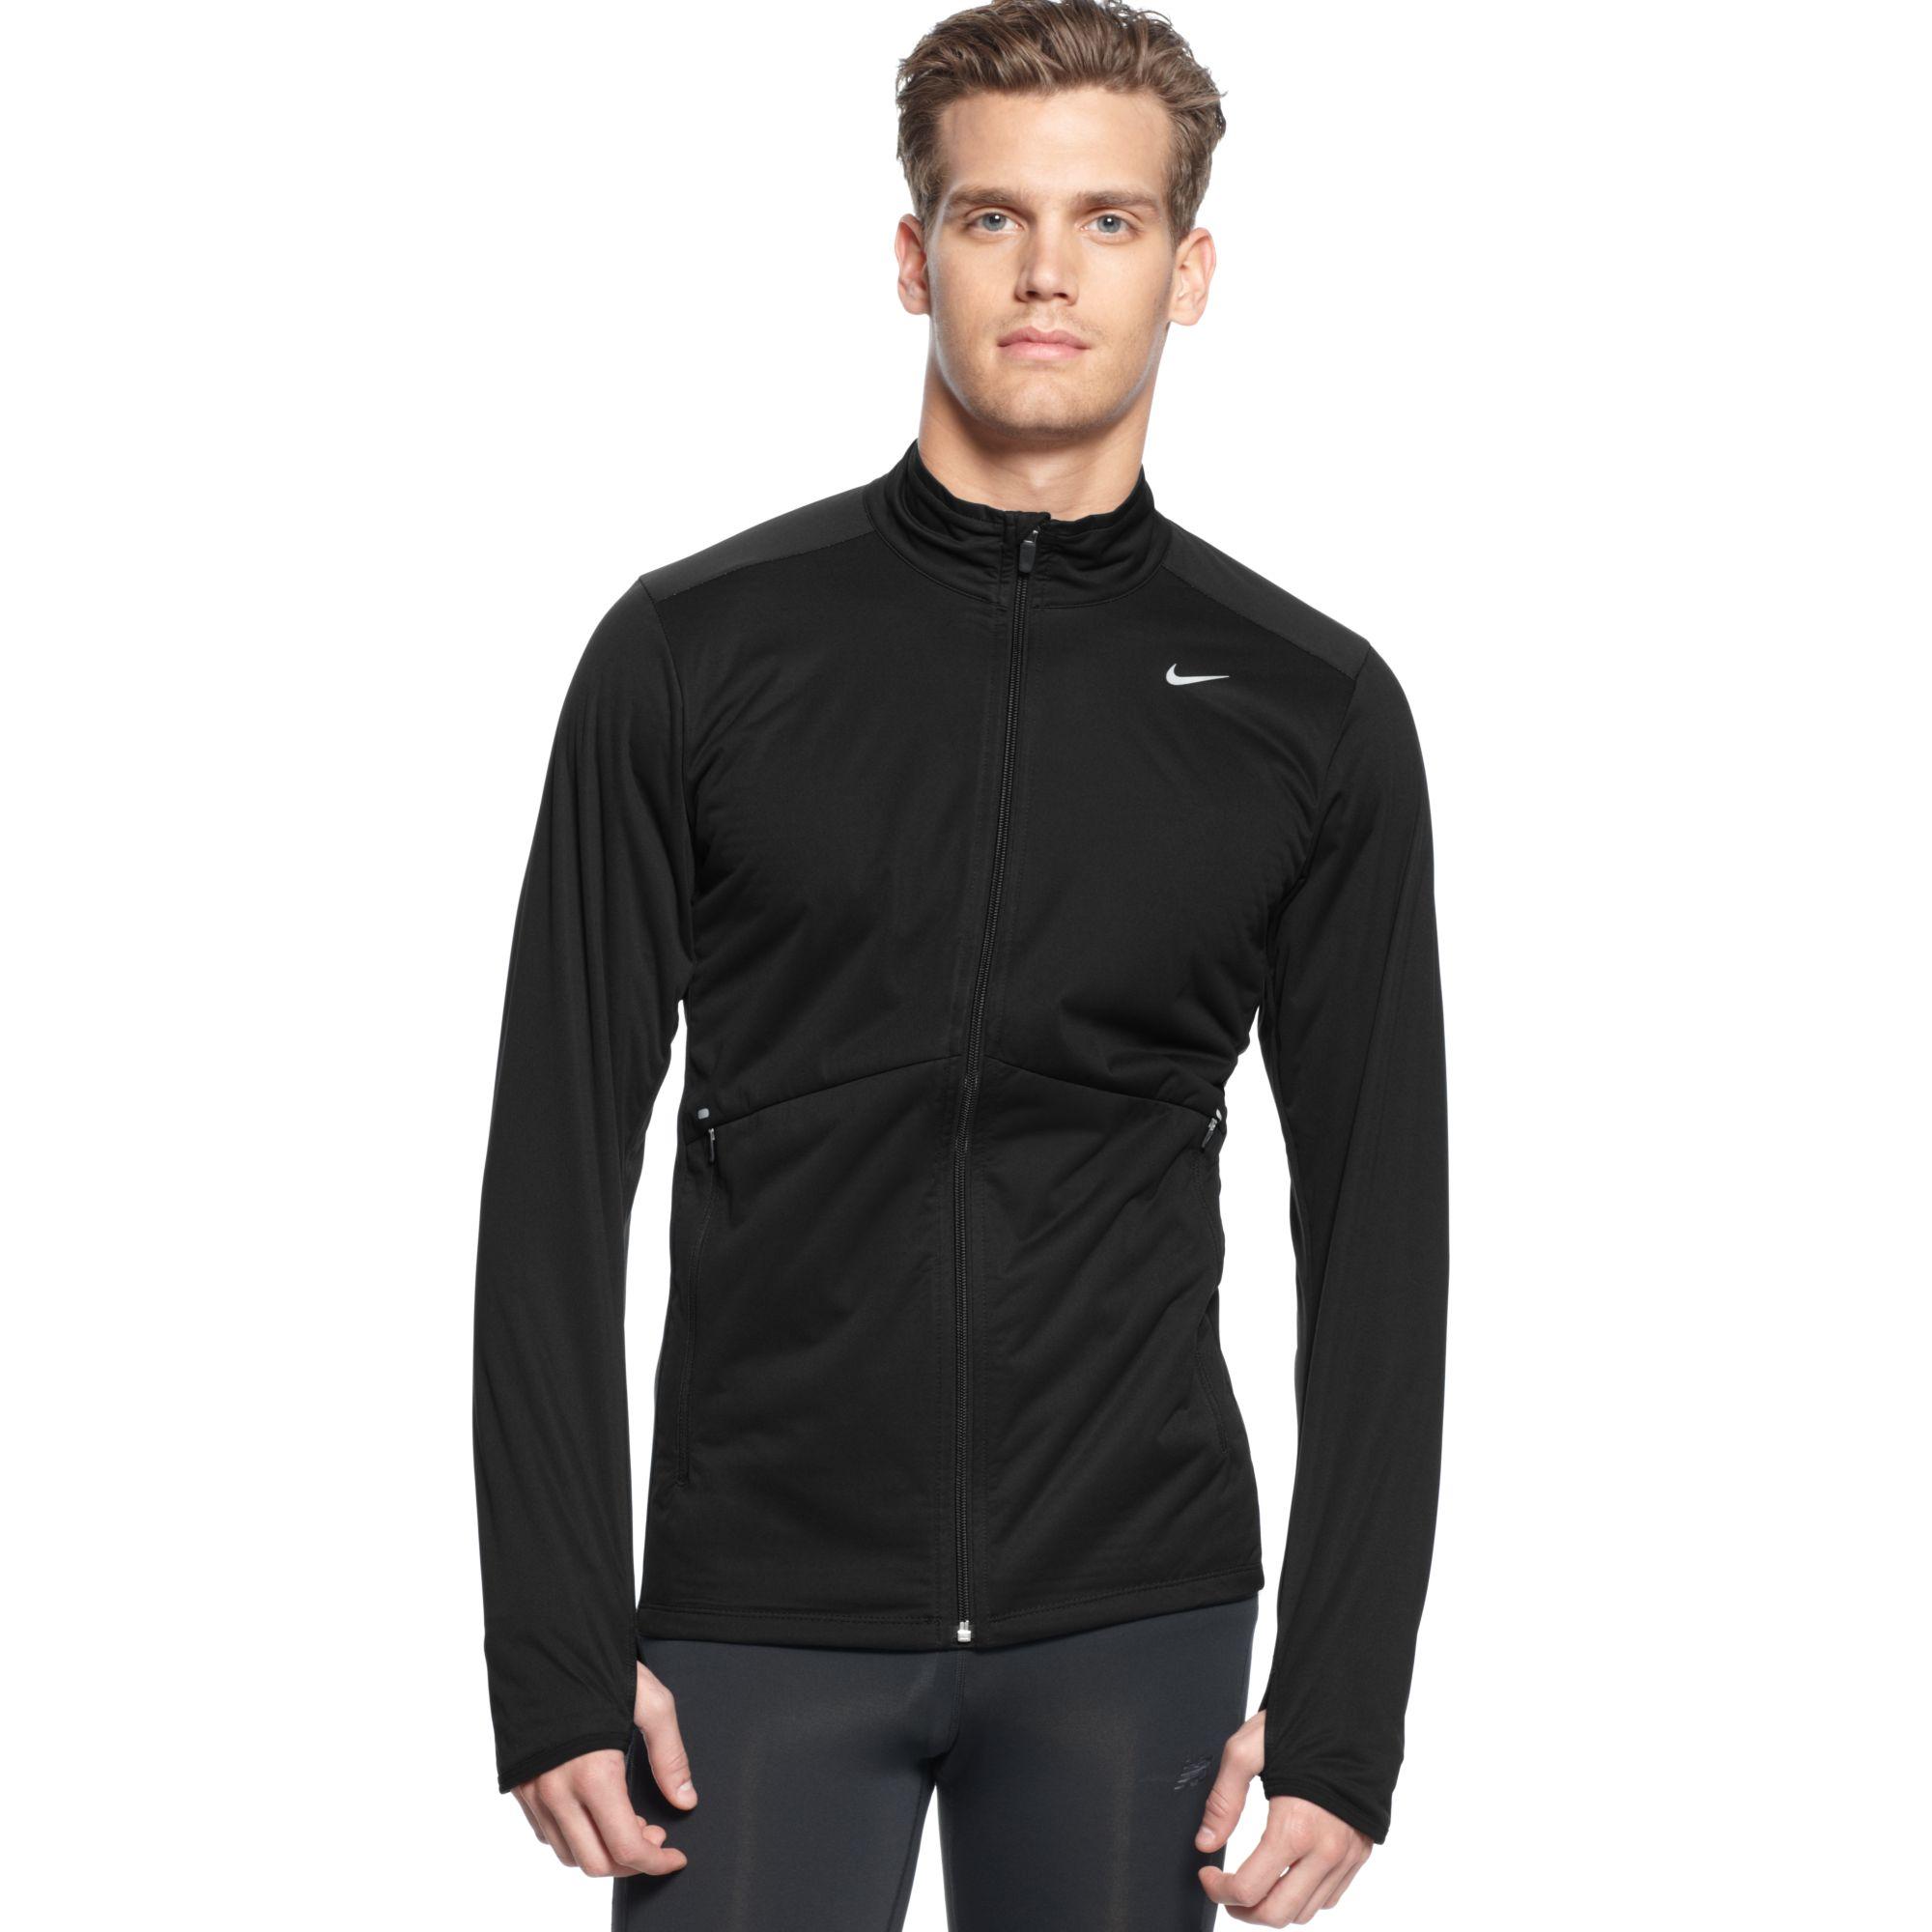 9afbd2a54ffe Lyst - Nike Element Shield Drifit Fullzip Running Jacket in Black ...